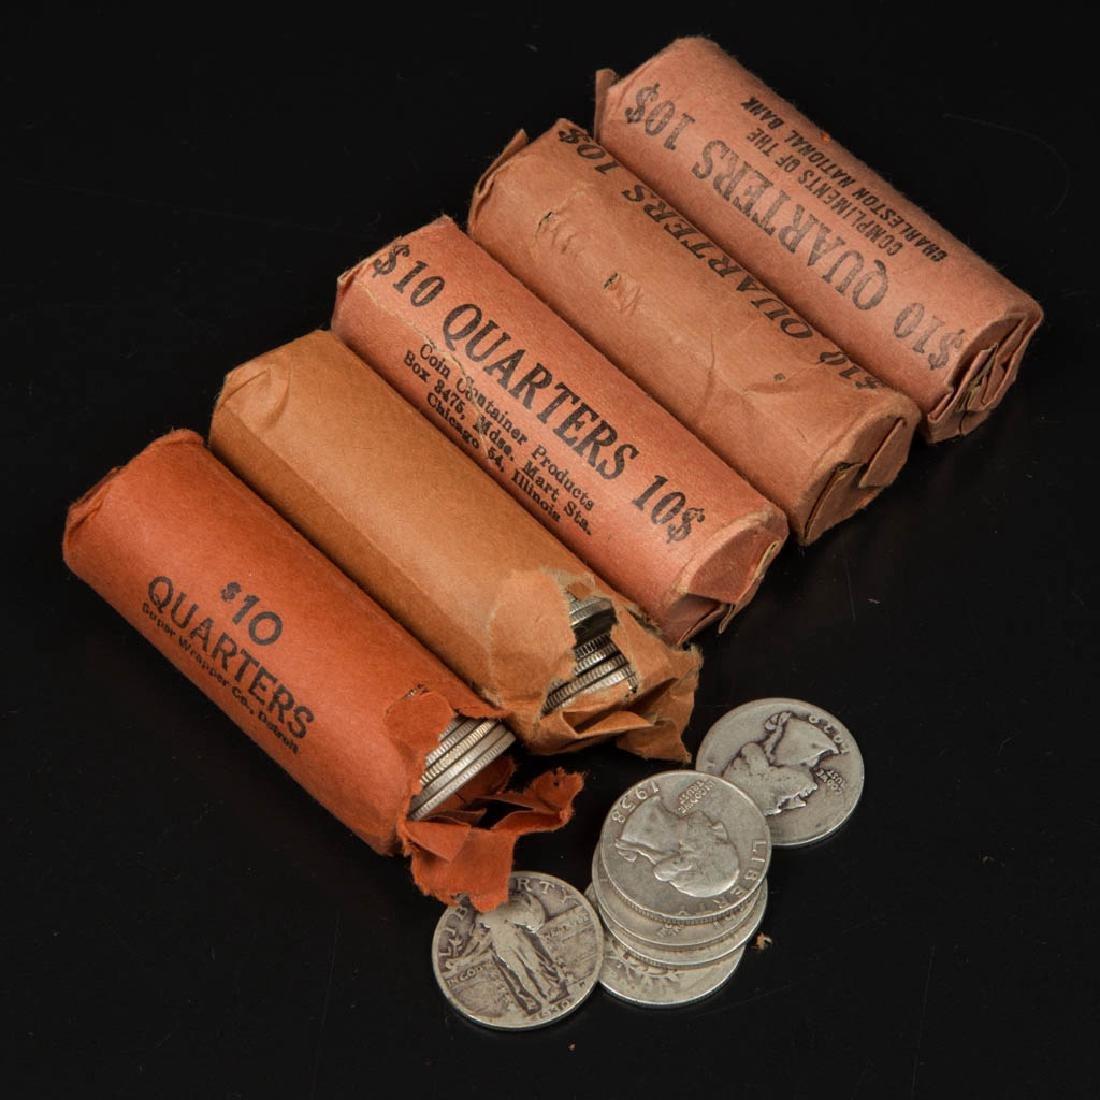 UNITED STATES SILVER WASHINGTON 25C COINS